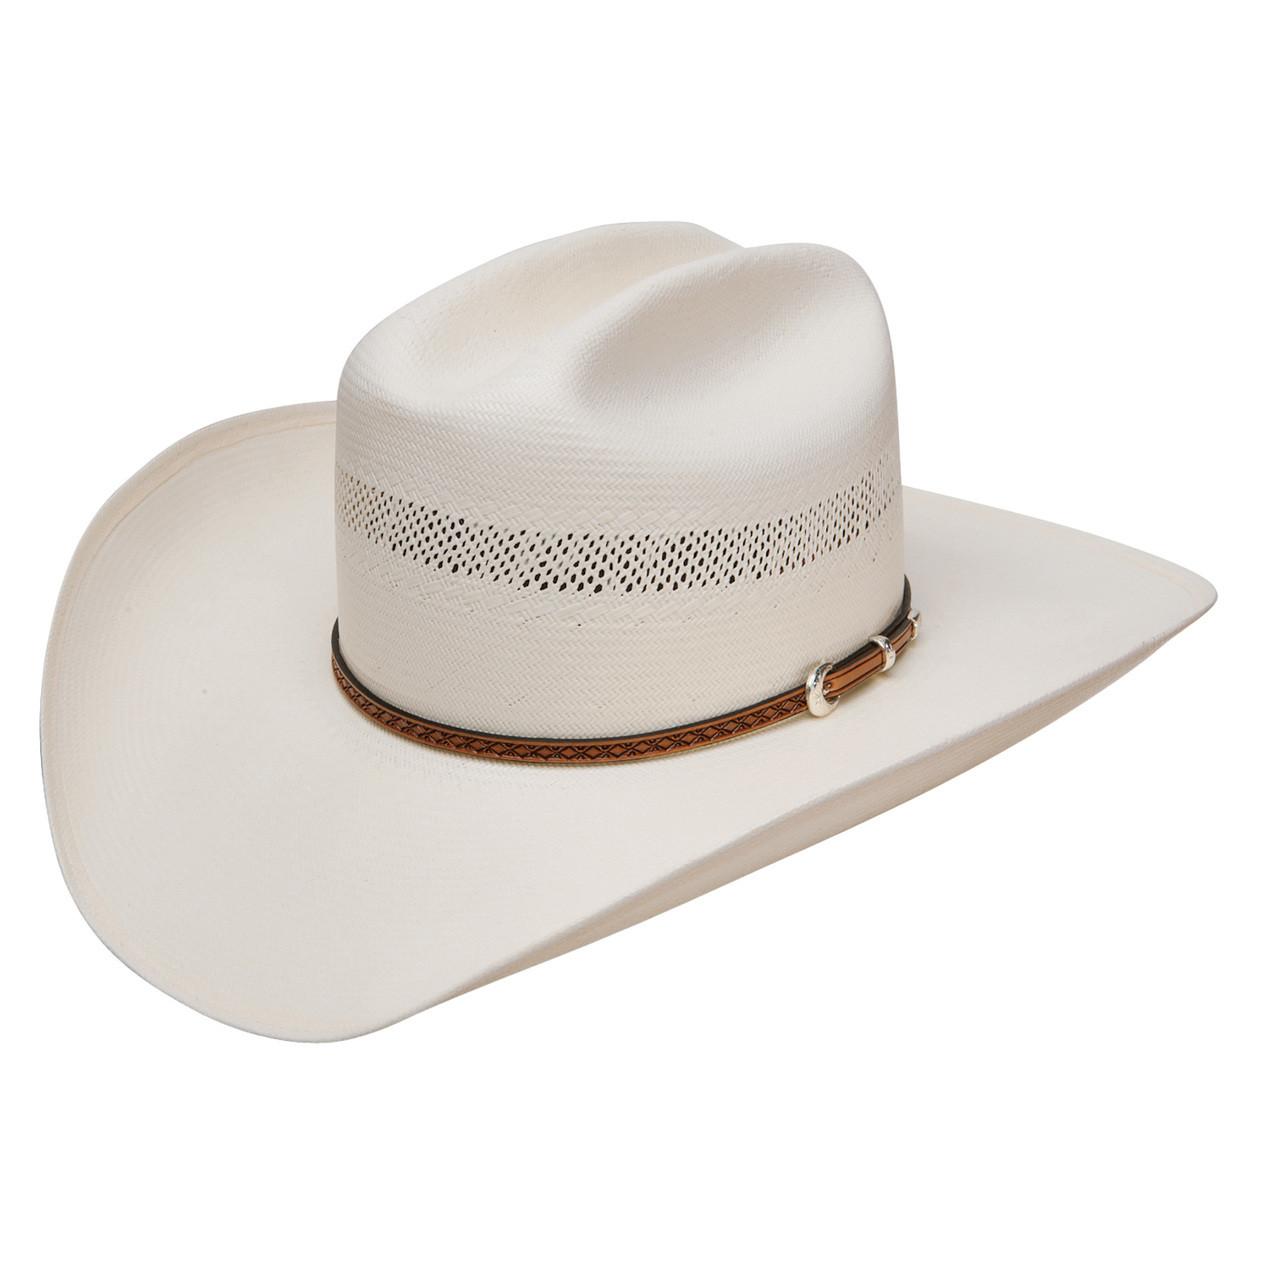 3142a2b946cc68 Stetson Straw Hat - 100X - Griffin - Billy's Western Wear